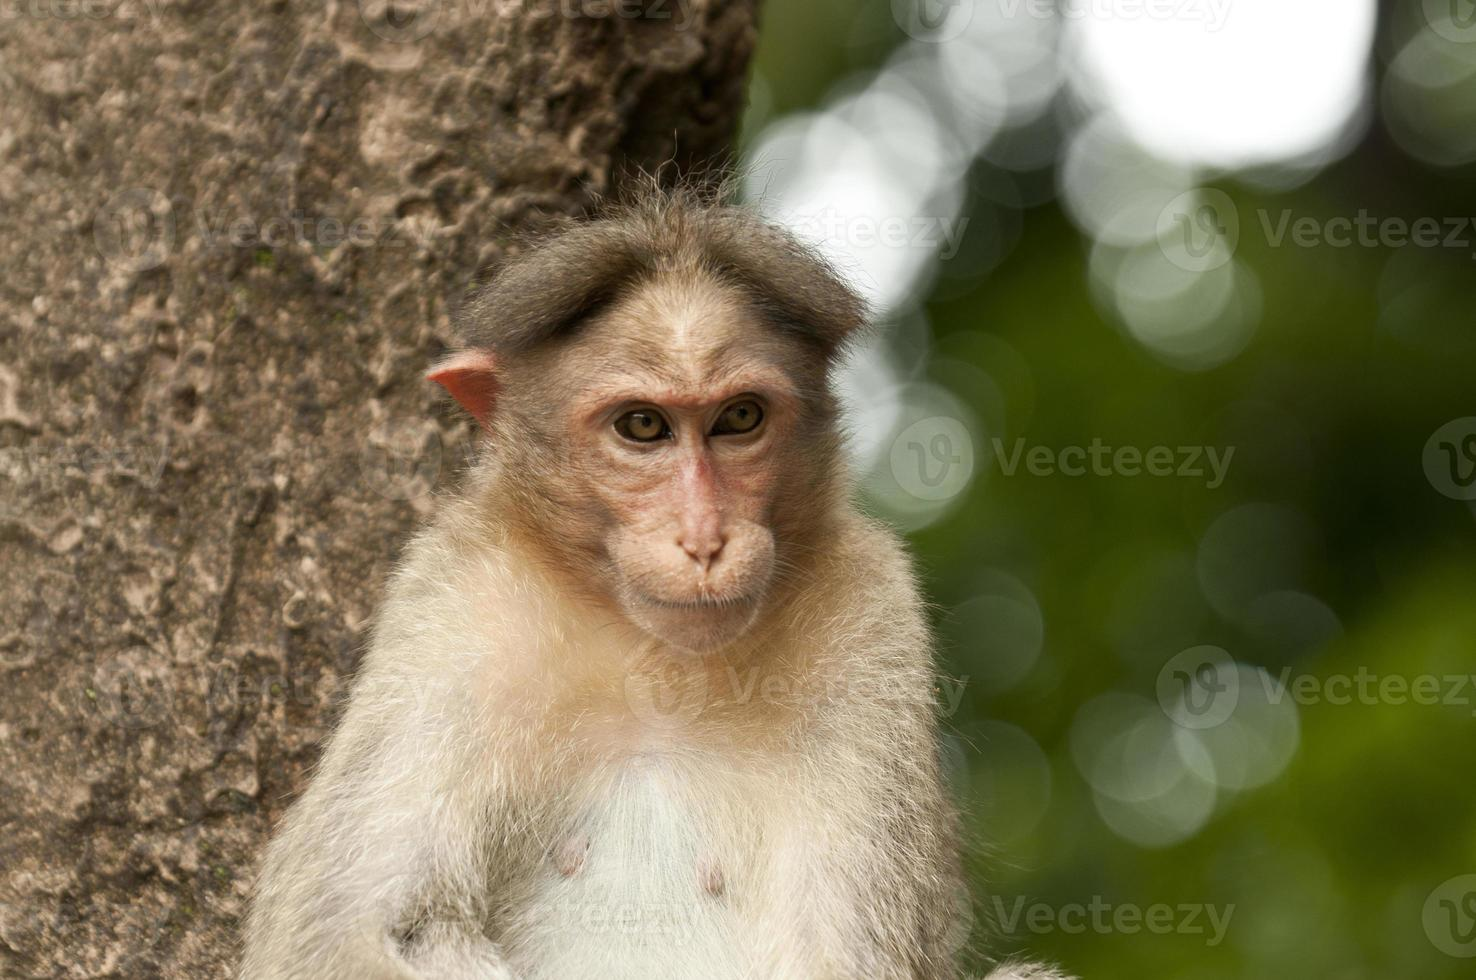 macaco bonito na árvore foto